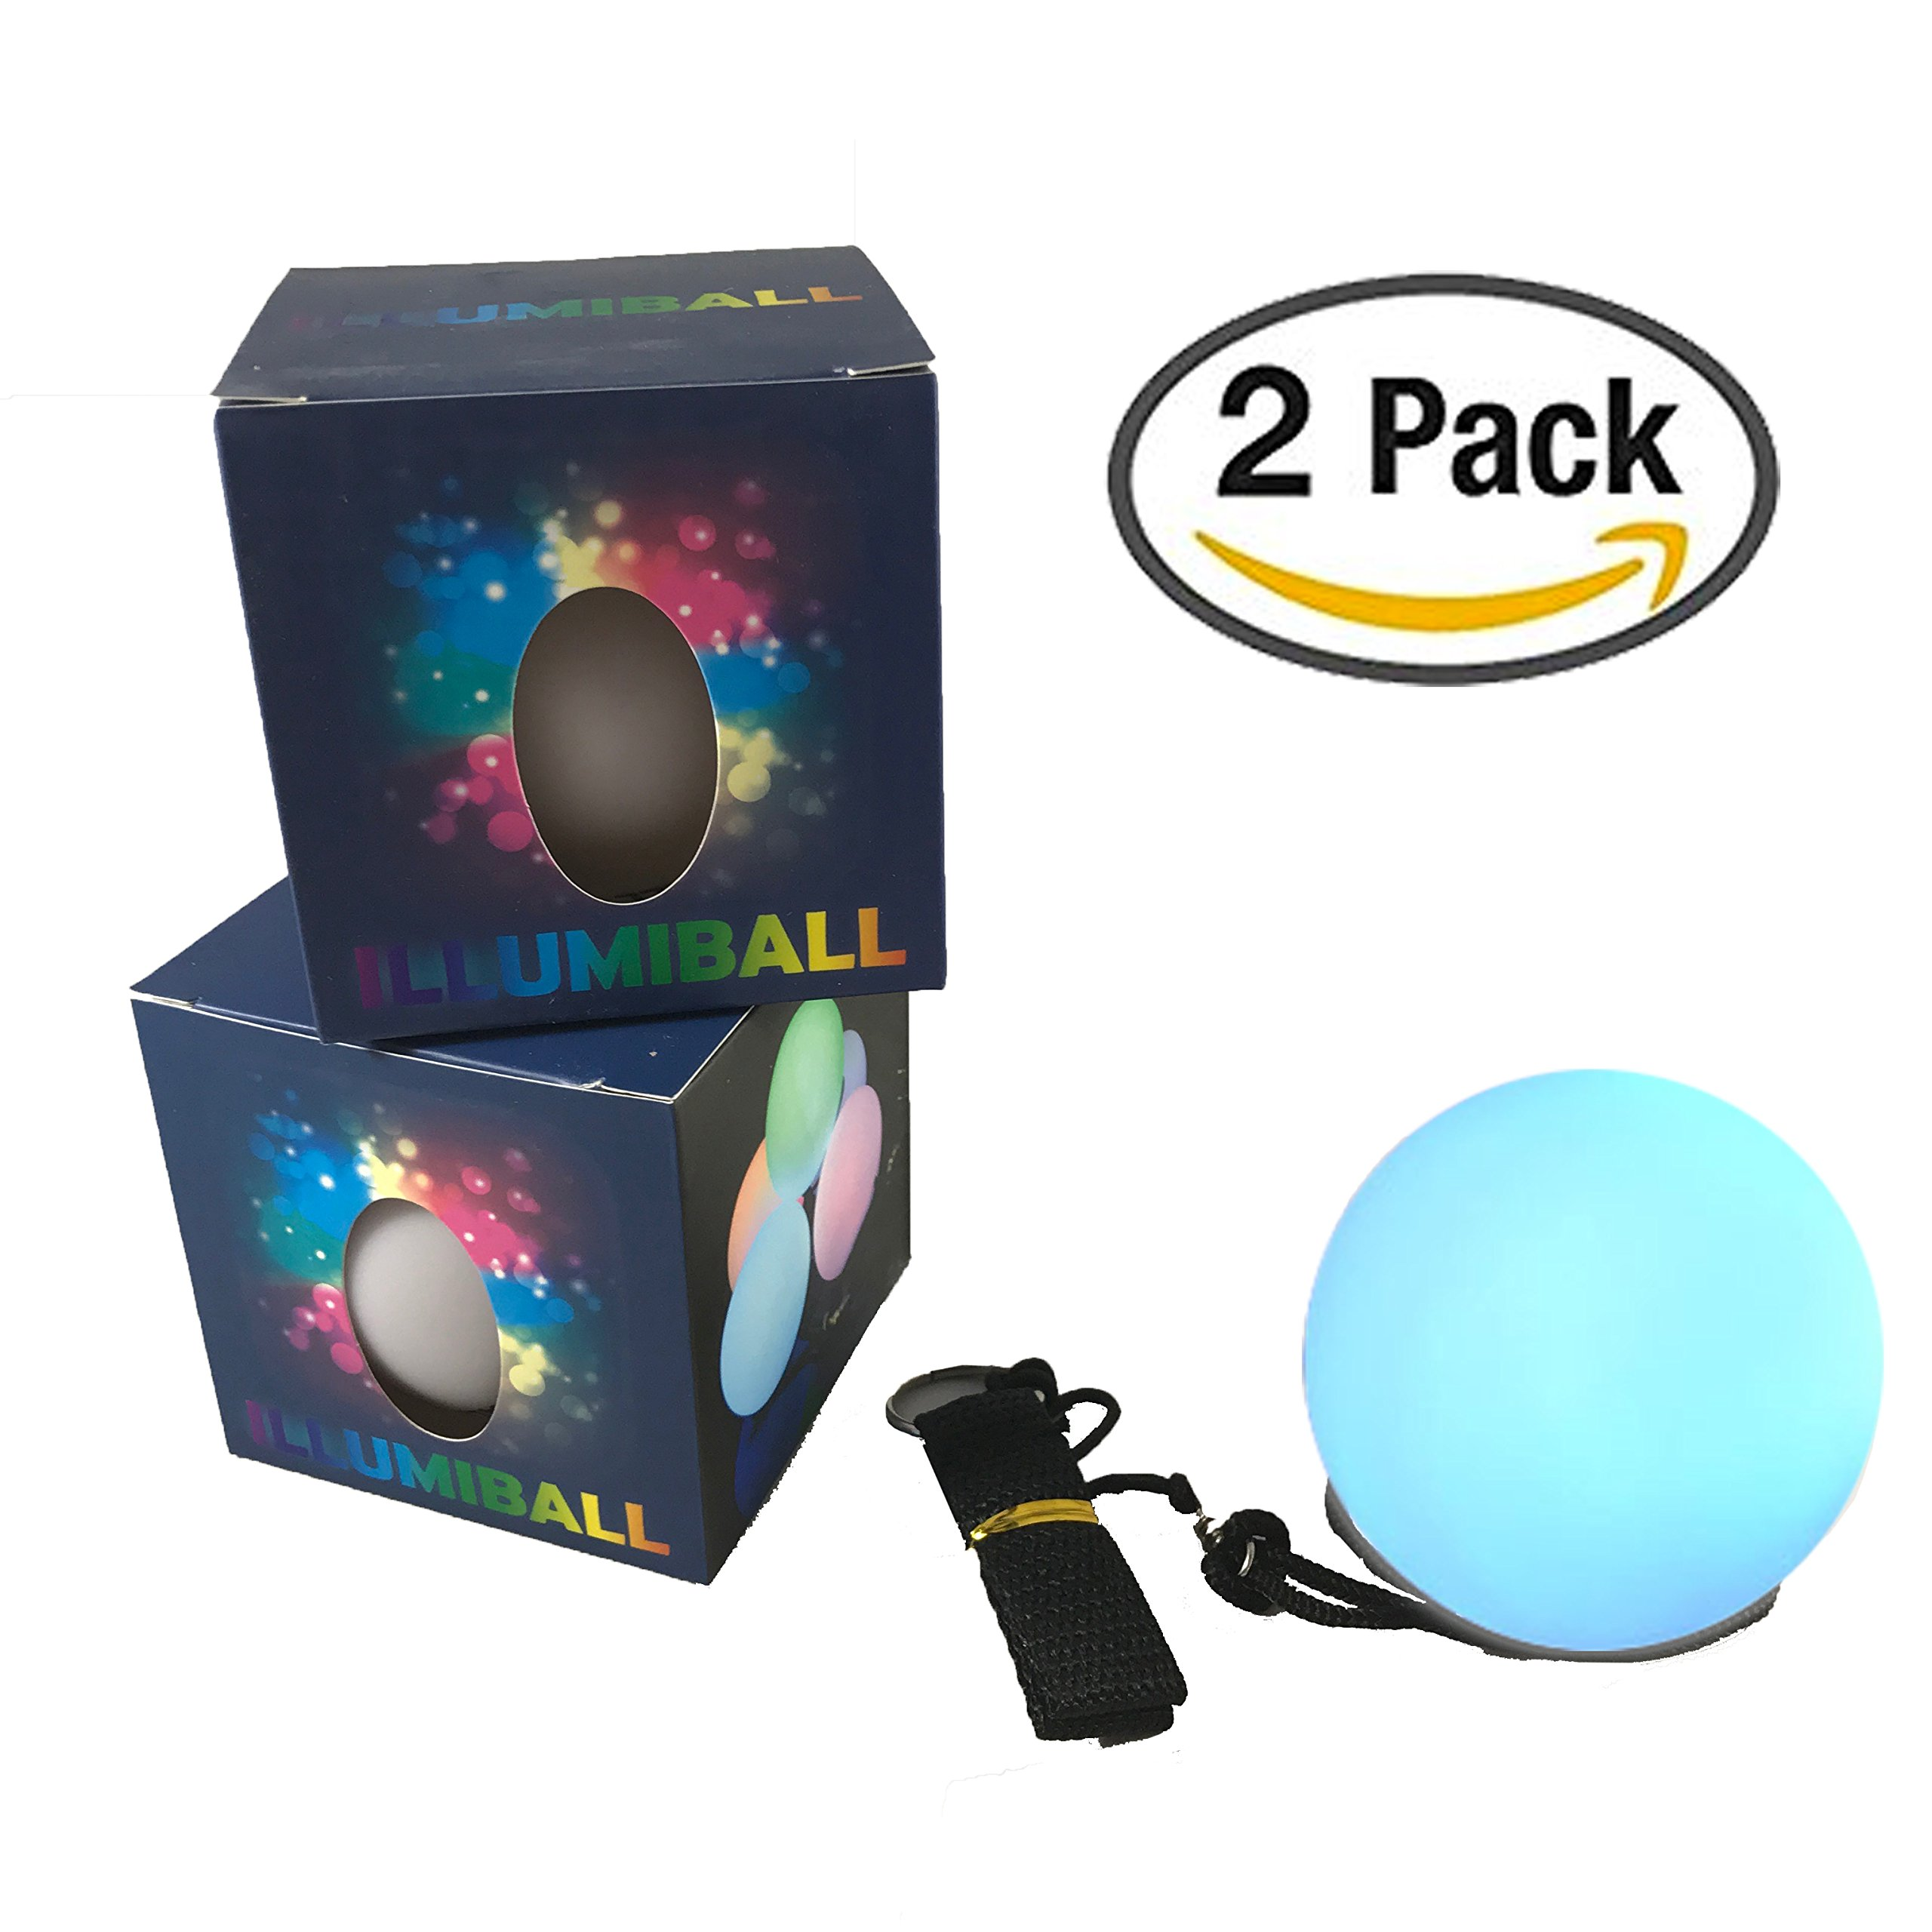 Illuminet ILLUMIBALL LED Light Ball POI: 2 Pack, LED POI Balls, Glow Balls, LED Ball Light, Light Up Balls, Rave Lights, Spinner Balls, Glow Balls, Stress Ball, Parties, Beach, Dances, Camping Fun